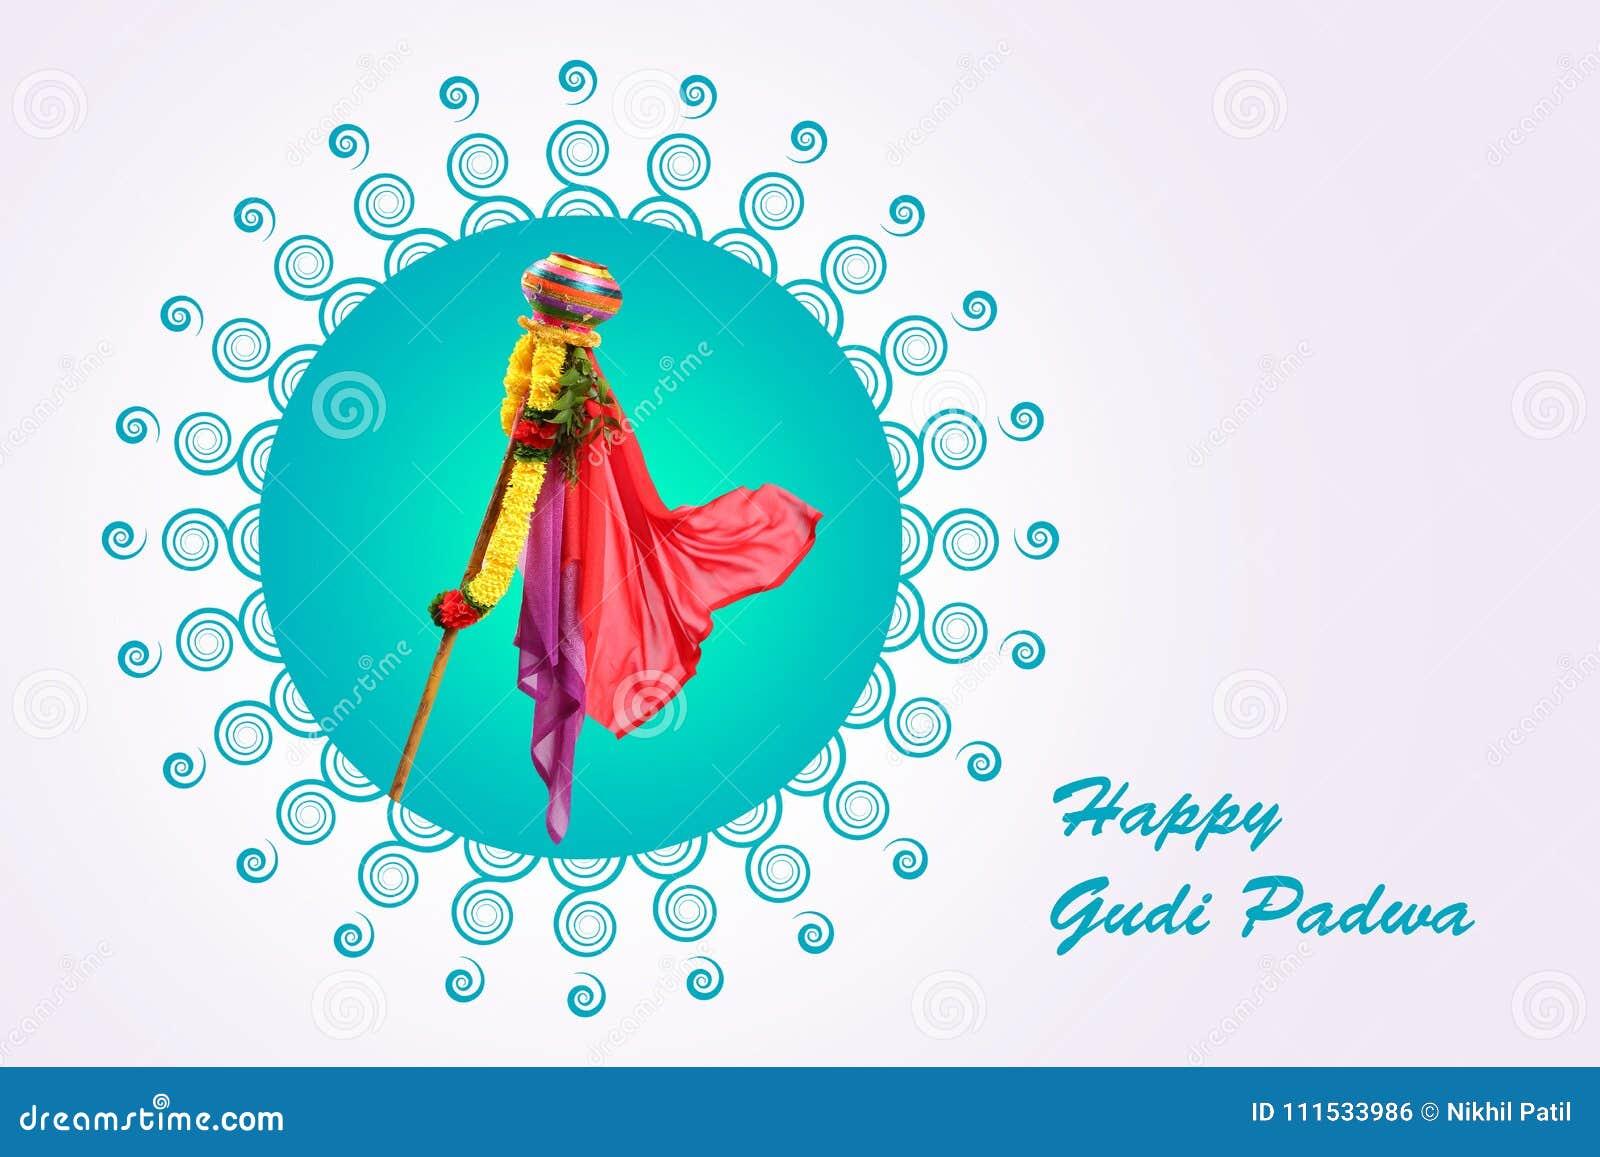 Gudi Padwa Marathi New Year Stock Illustration Illustration Of